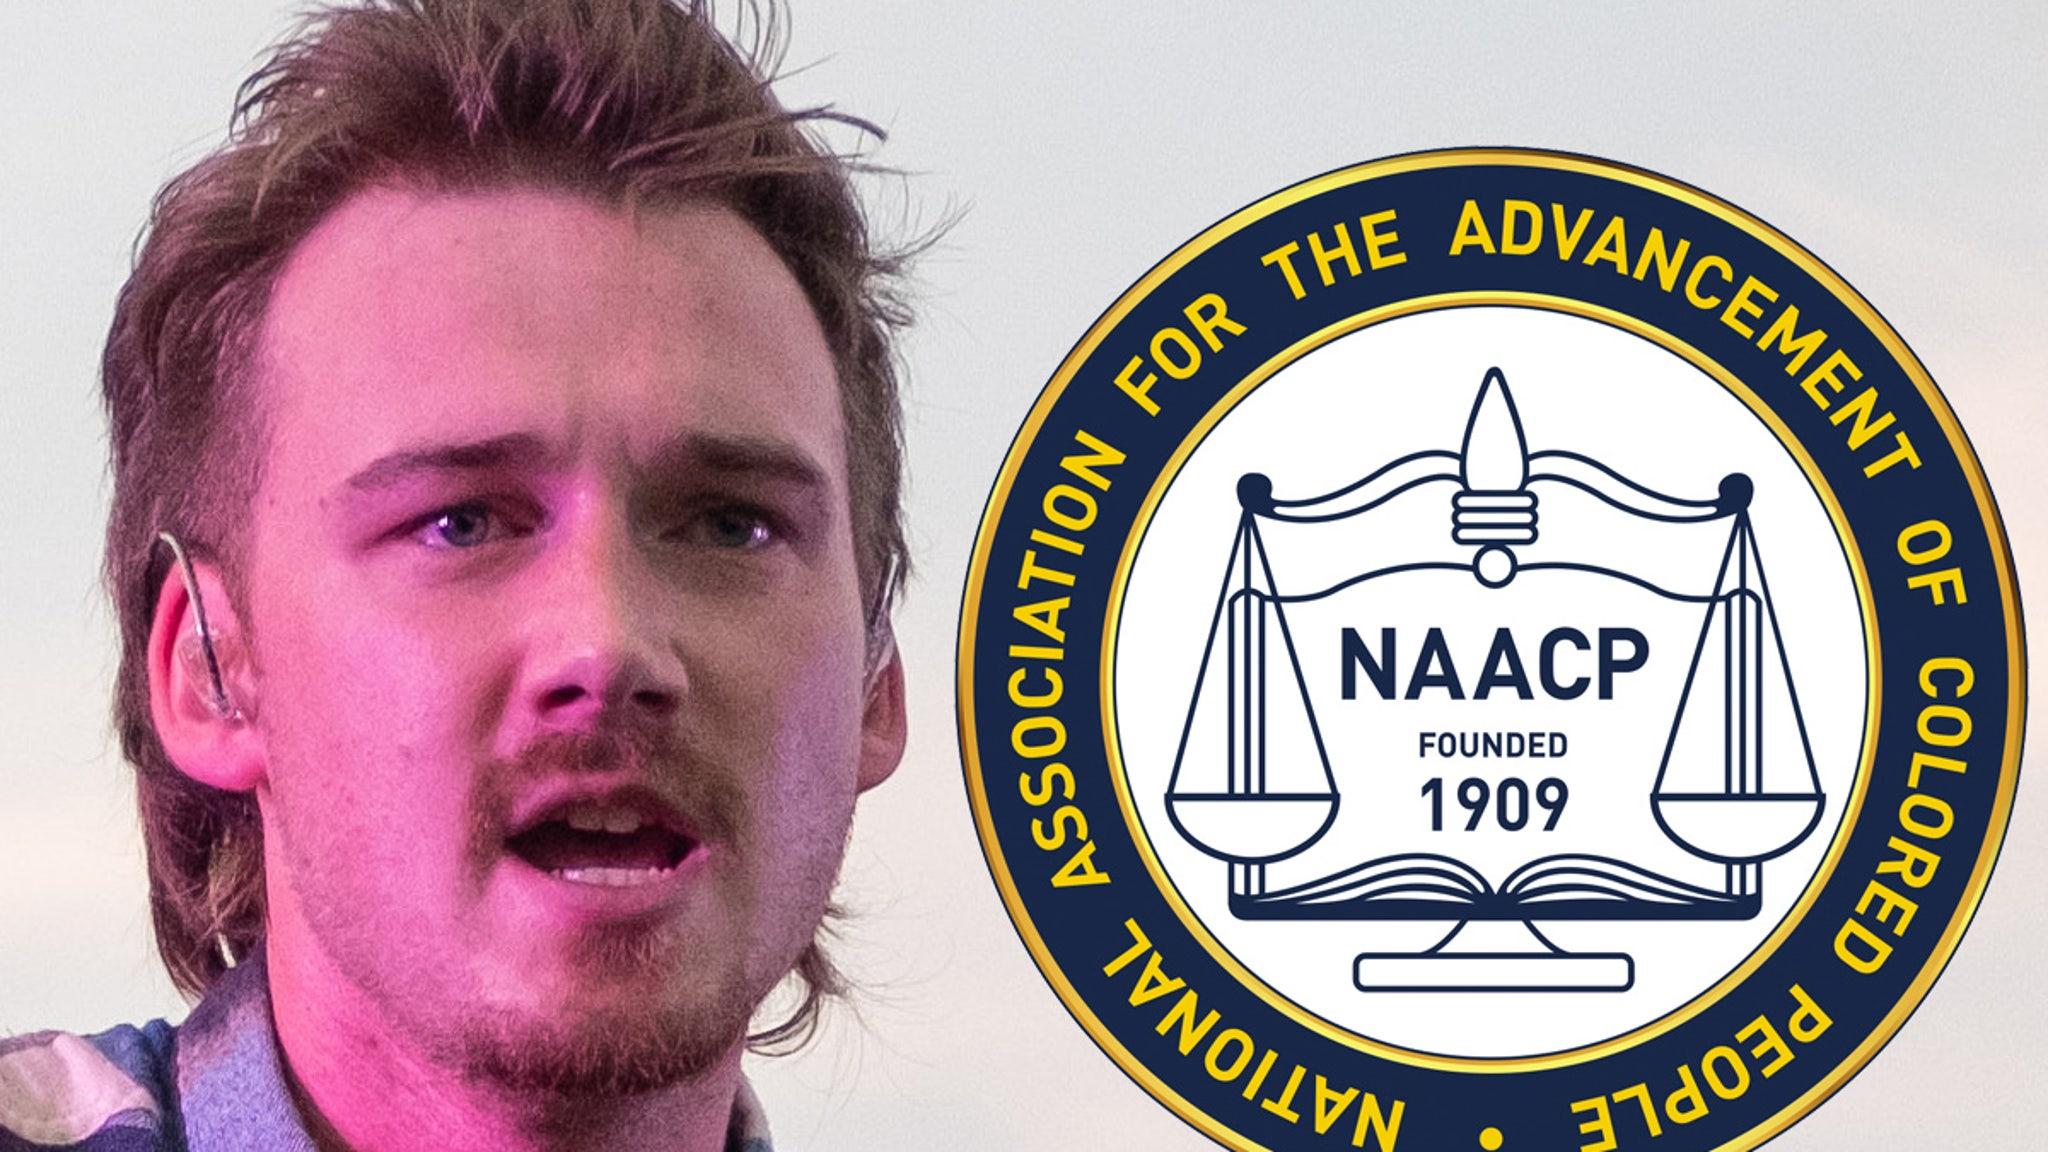 Morgan Wallen 'GMA' Interview Rings Hollow, Says Nashville NAACP President thumbnail